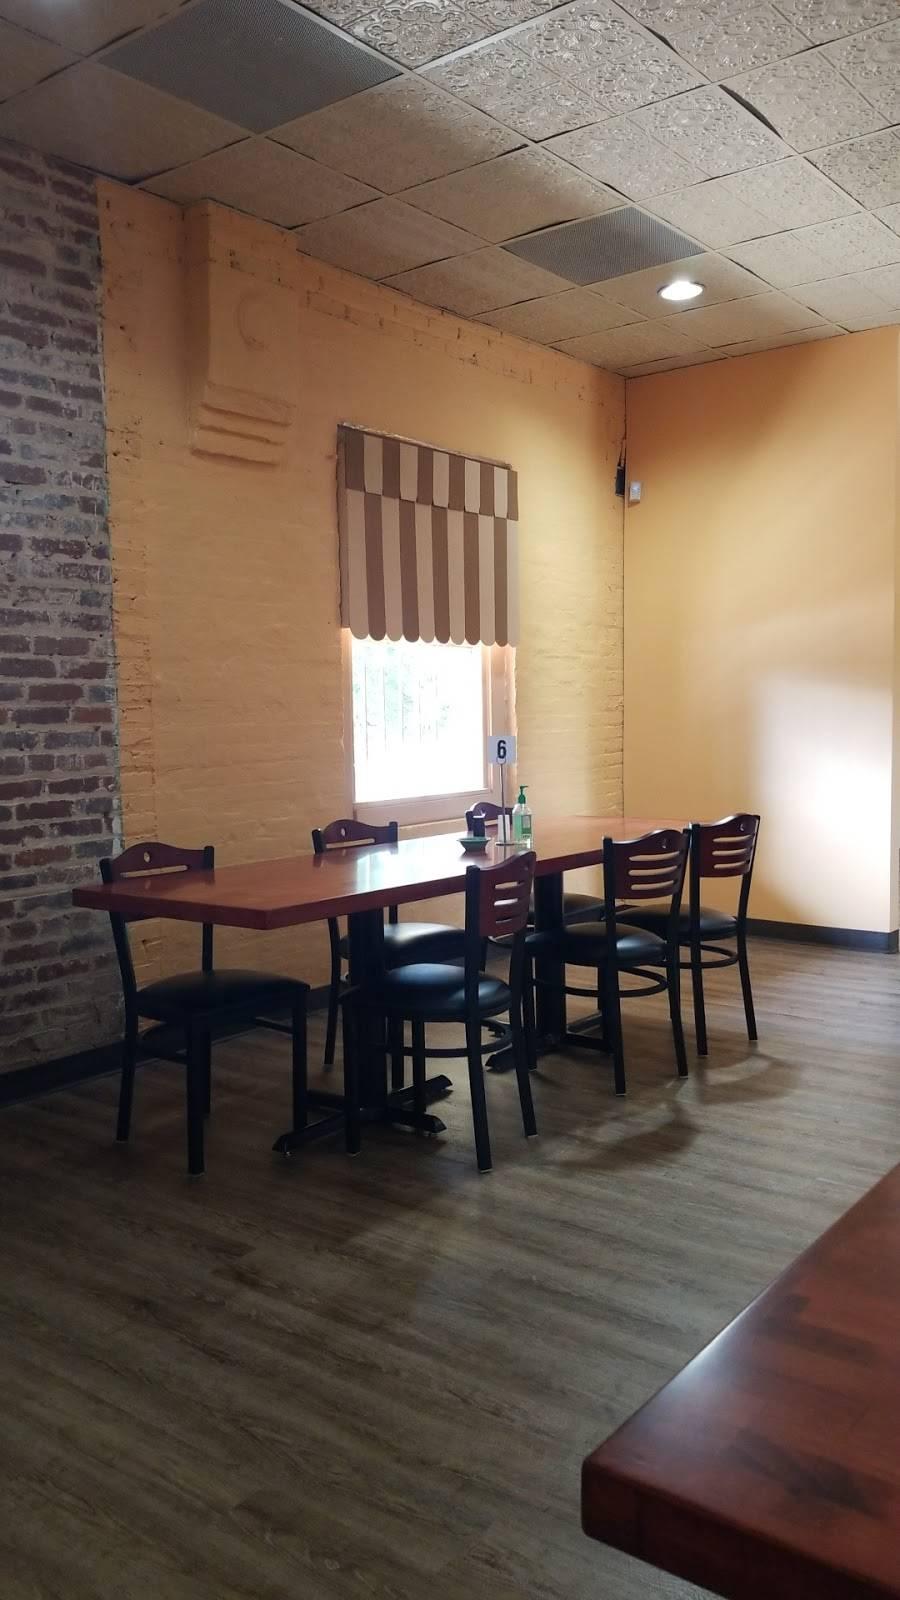 Armandos Mexican Kitchen | restaurant | 70 W Broad St, Fairburn, GA 30213, USA | 7709649909 OR +1 770-964-9909